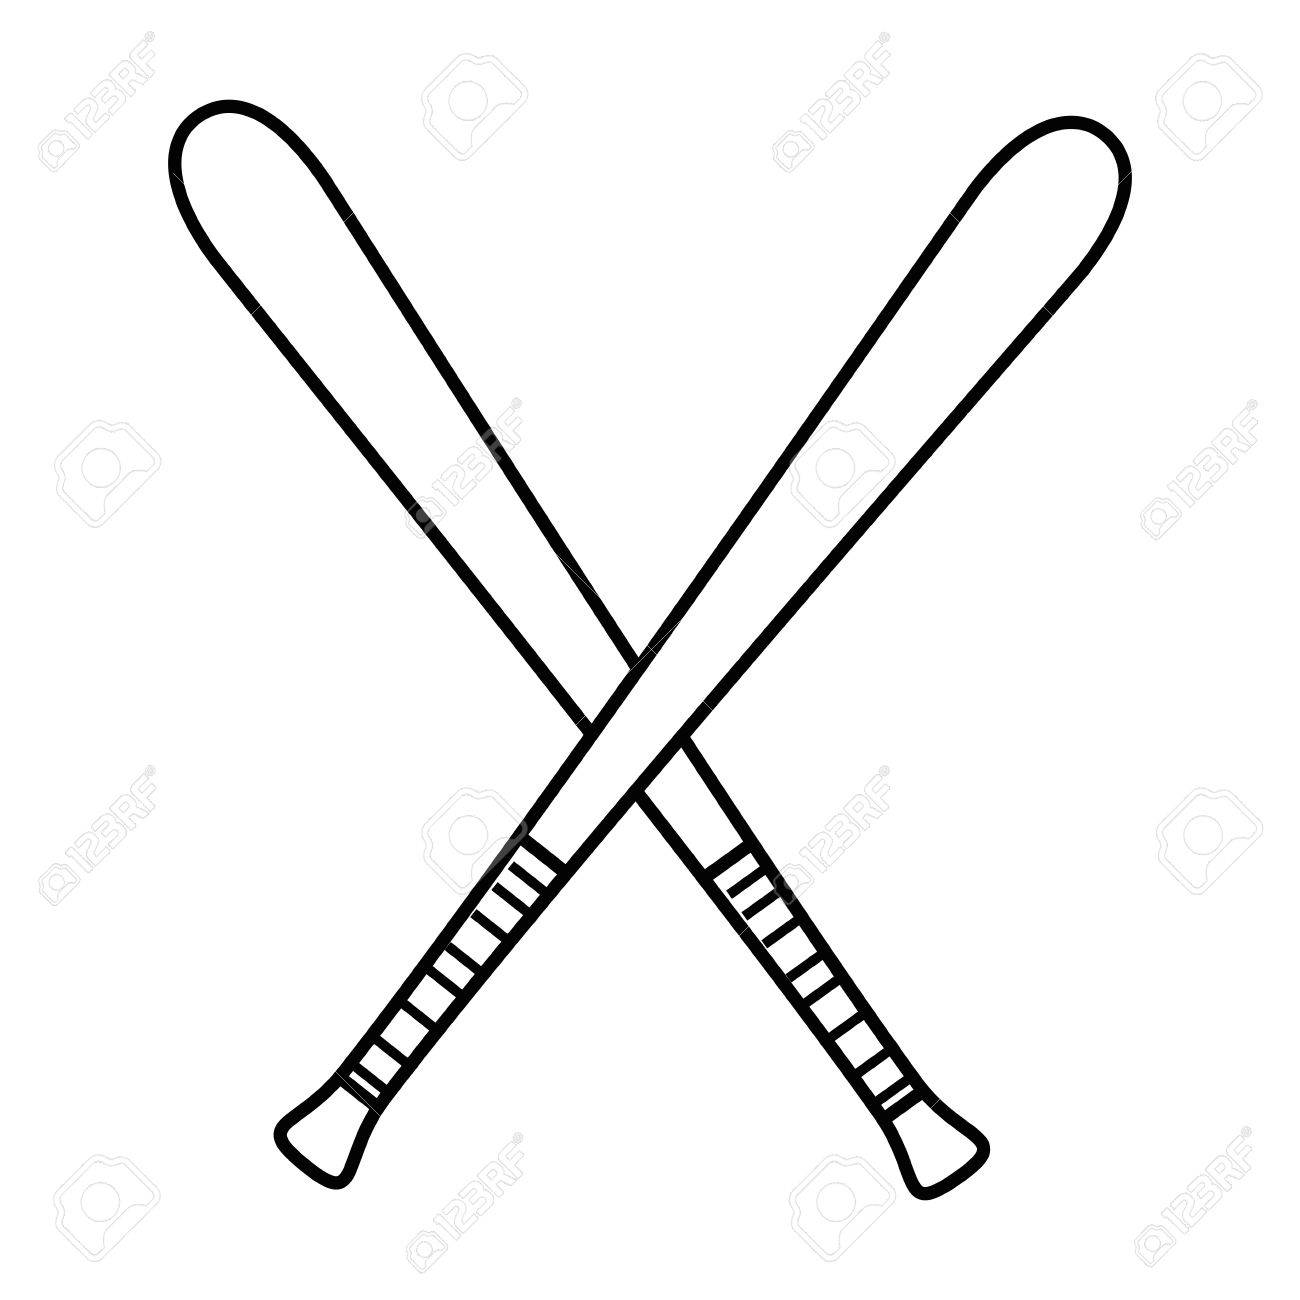 baseball bats crossed icon over white background vector illustration.